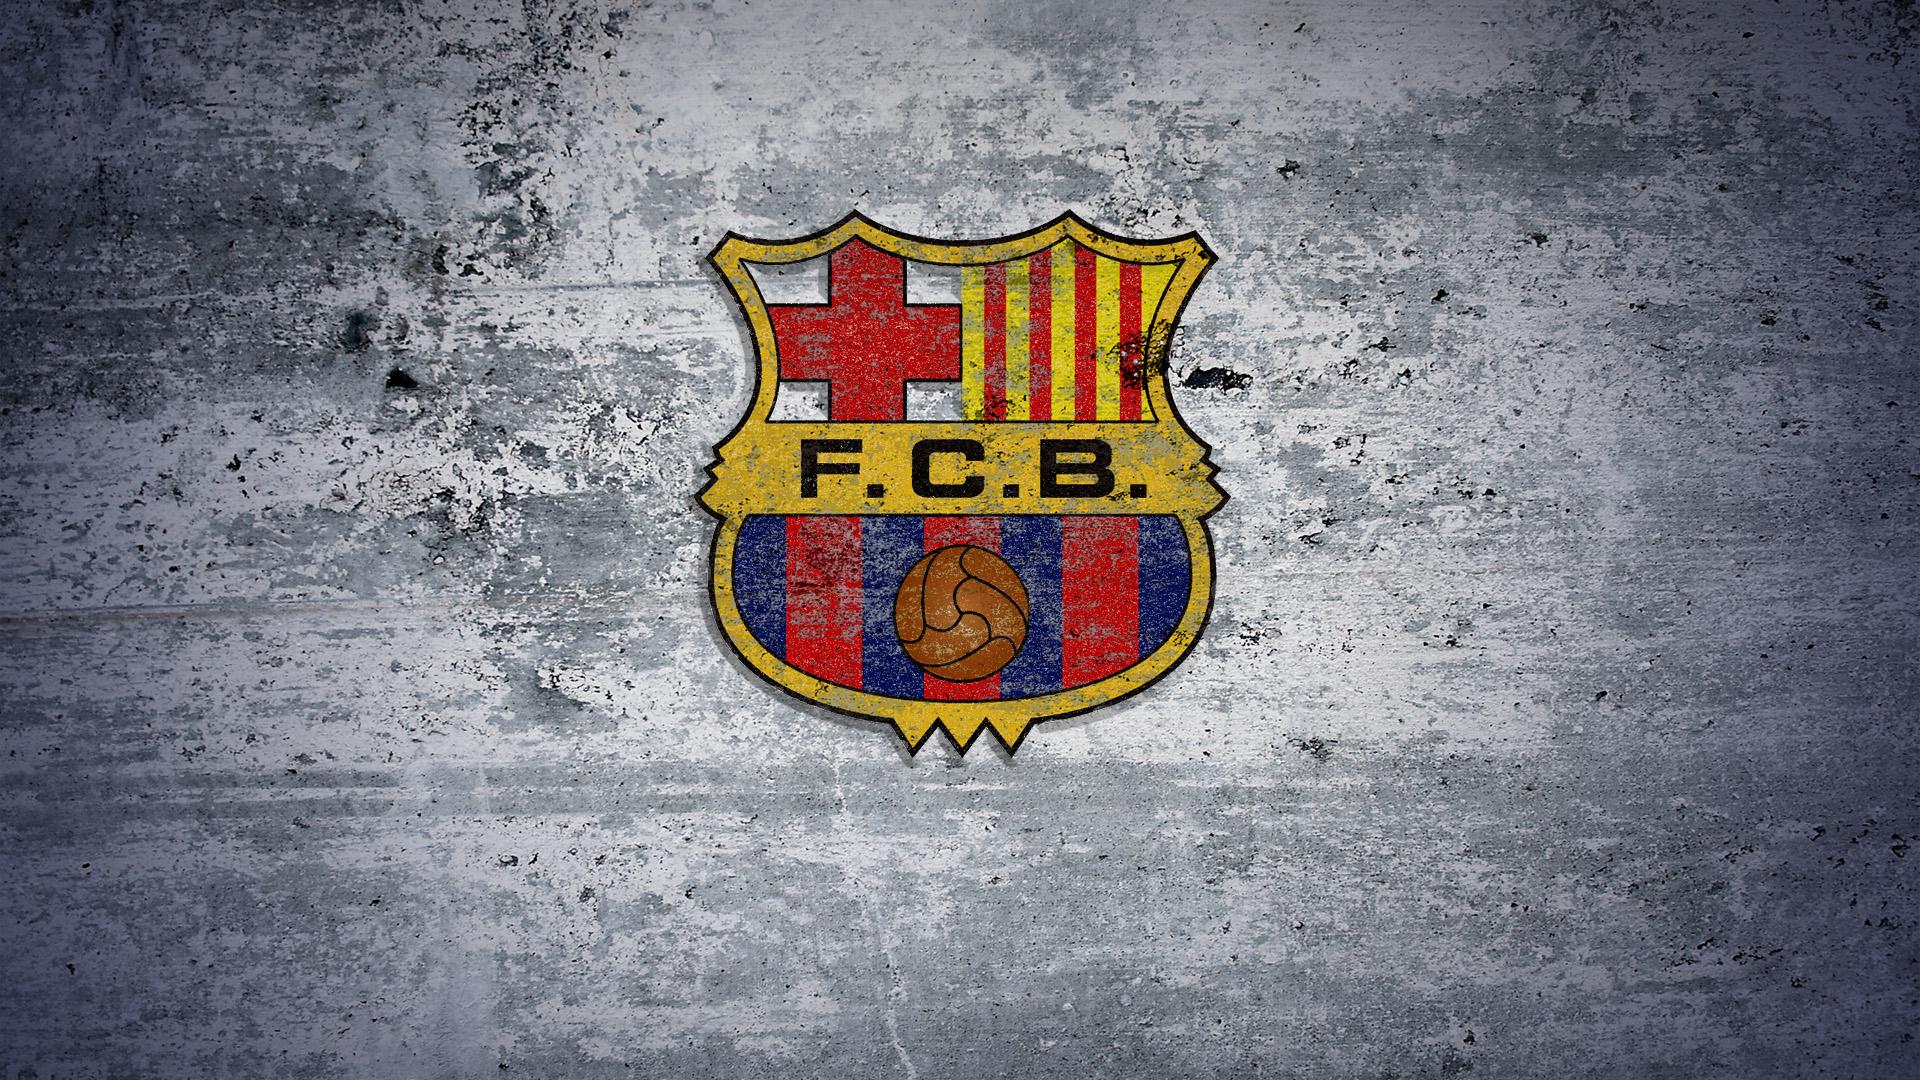 hd fc barcelona wallpaper hd wallpaper forputer fc barcelona logo Car 1920x1080